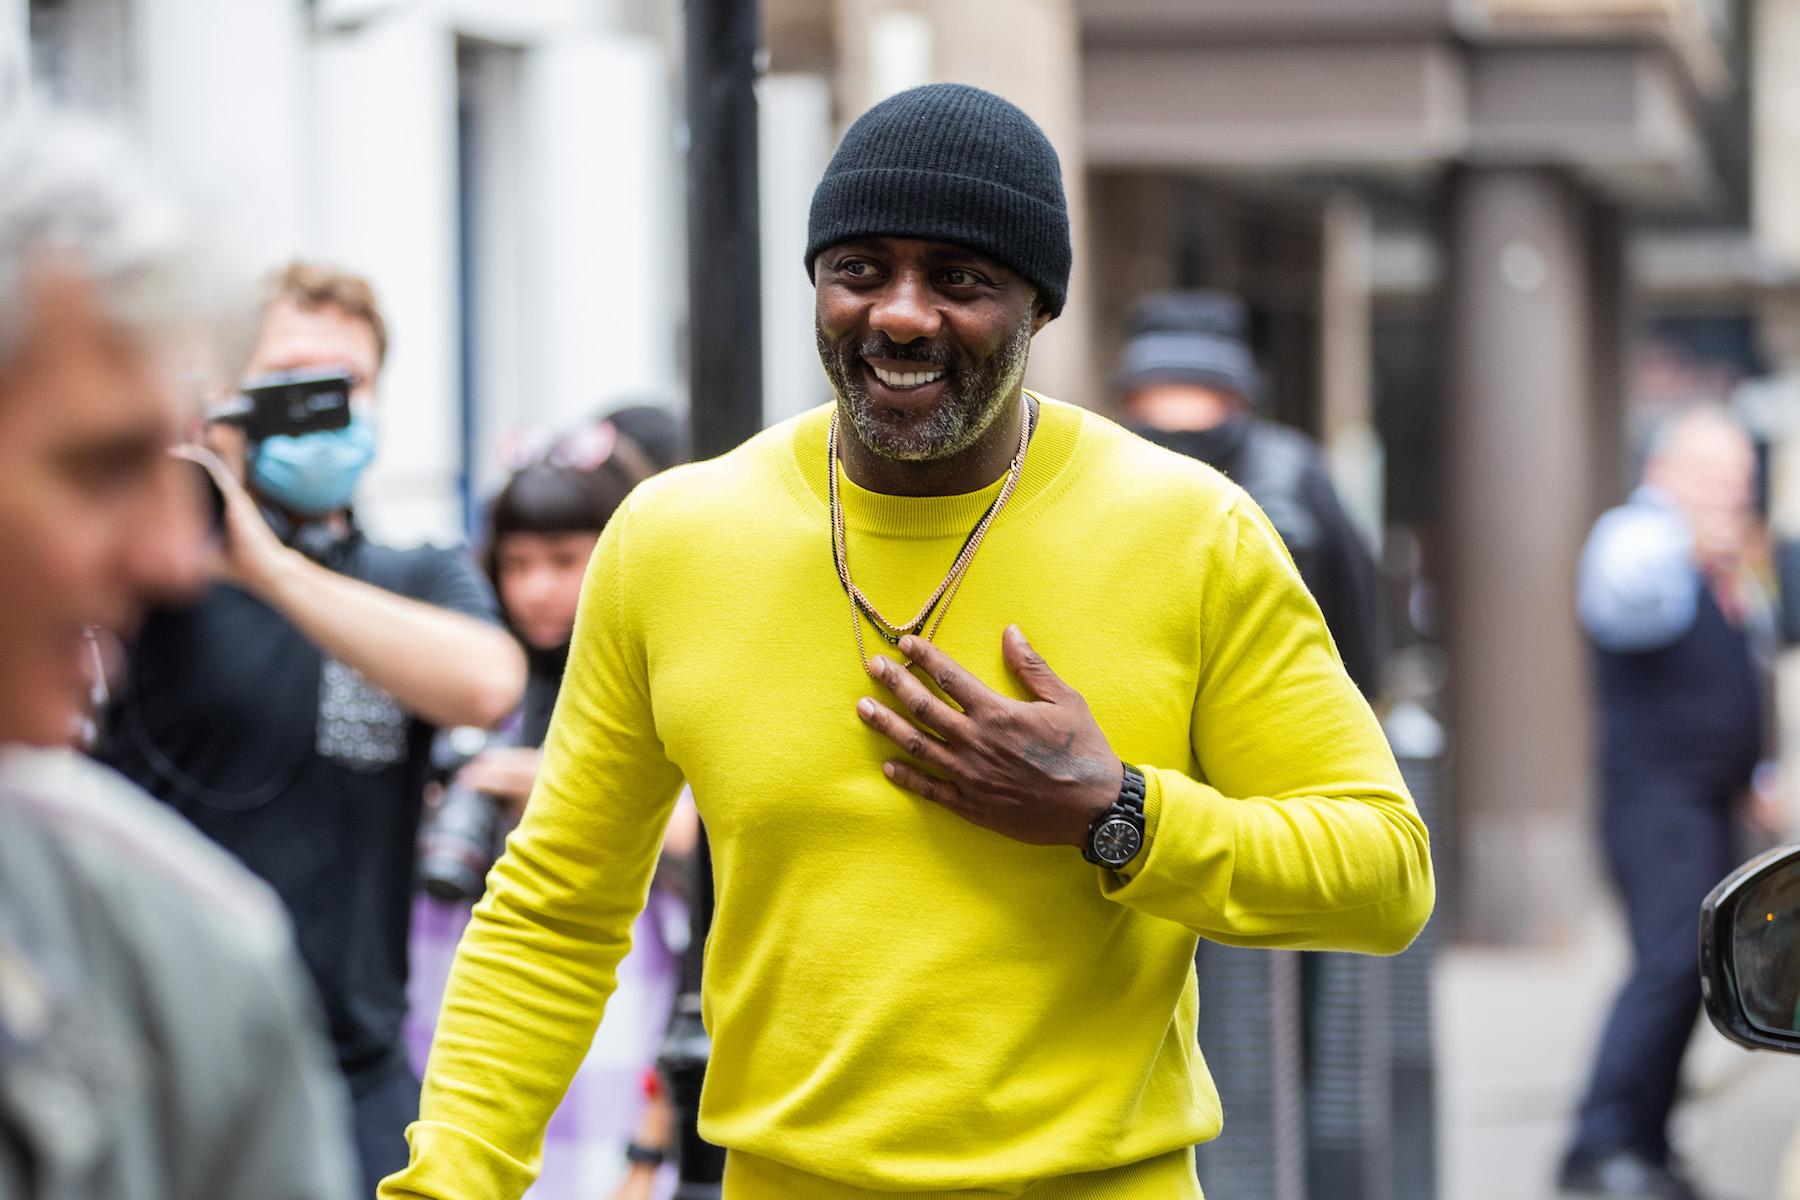 Idris Elba's 'Stealthy' Custom Rolex Is Absolute James Bond Material